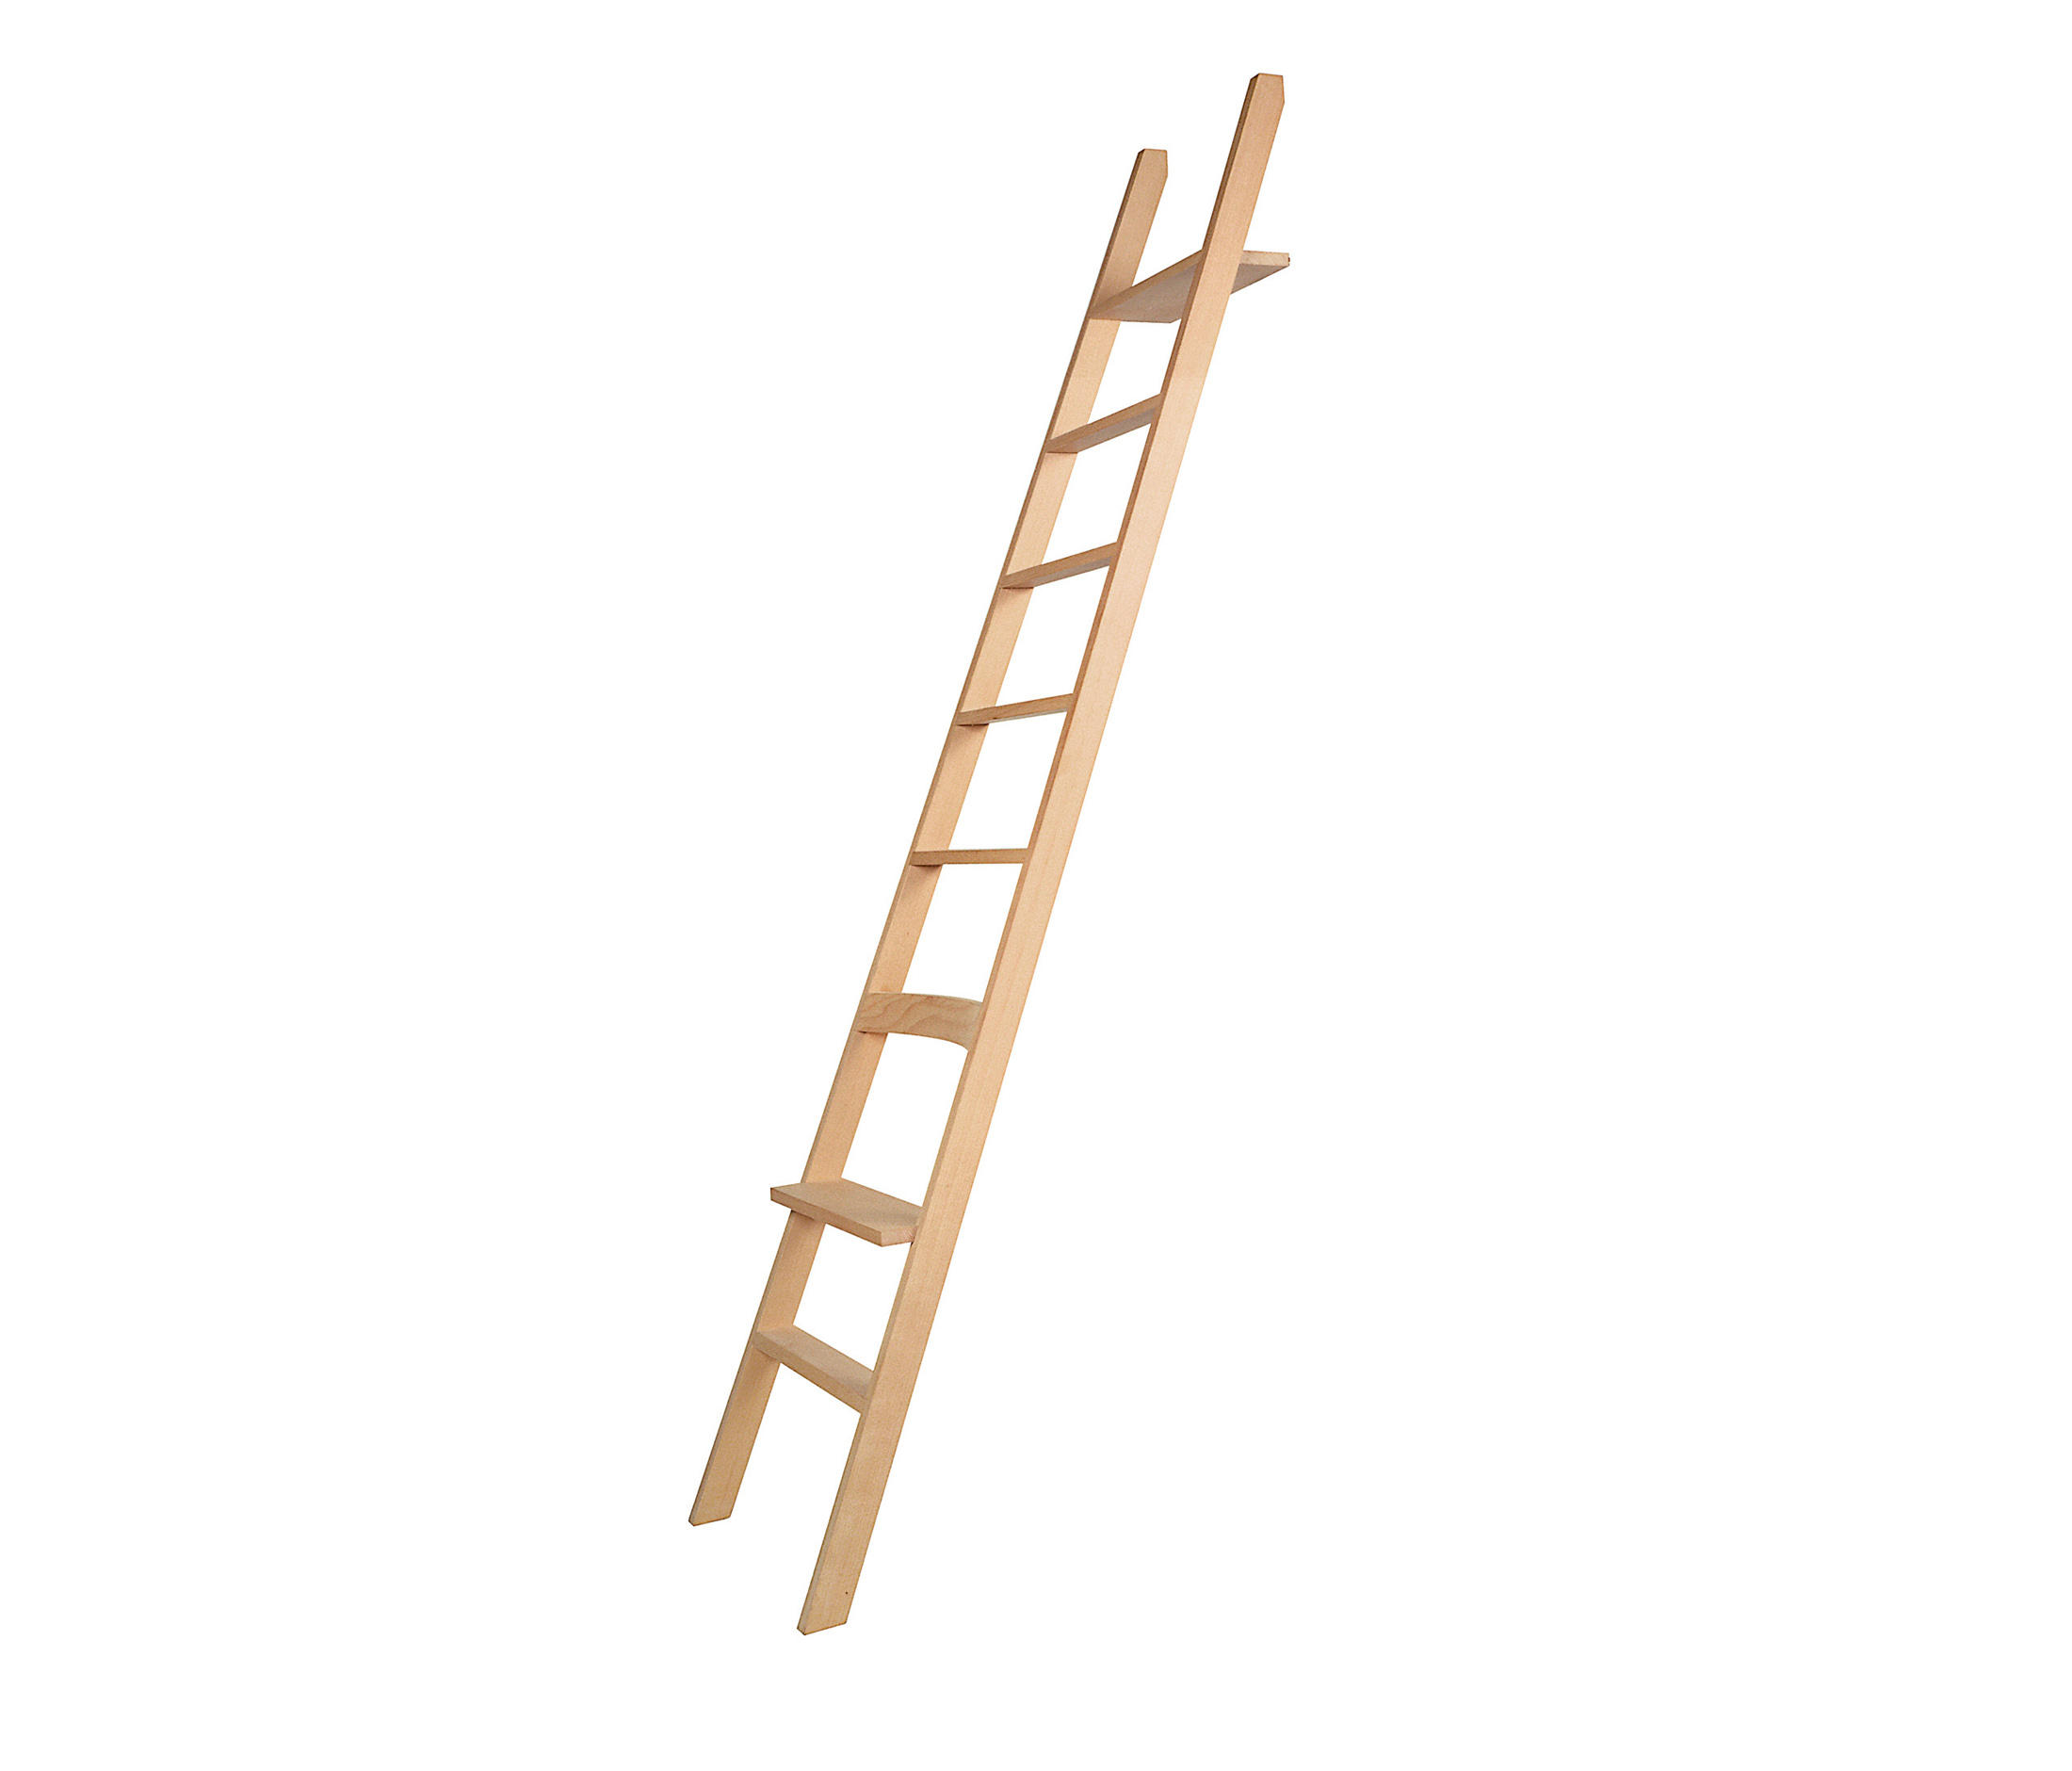 Hochacht library ladders from moormann architonic - Escalera de biblioteca ...